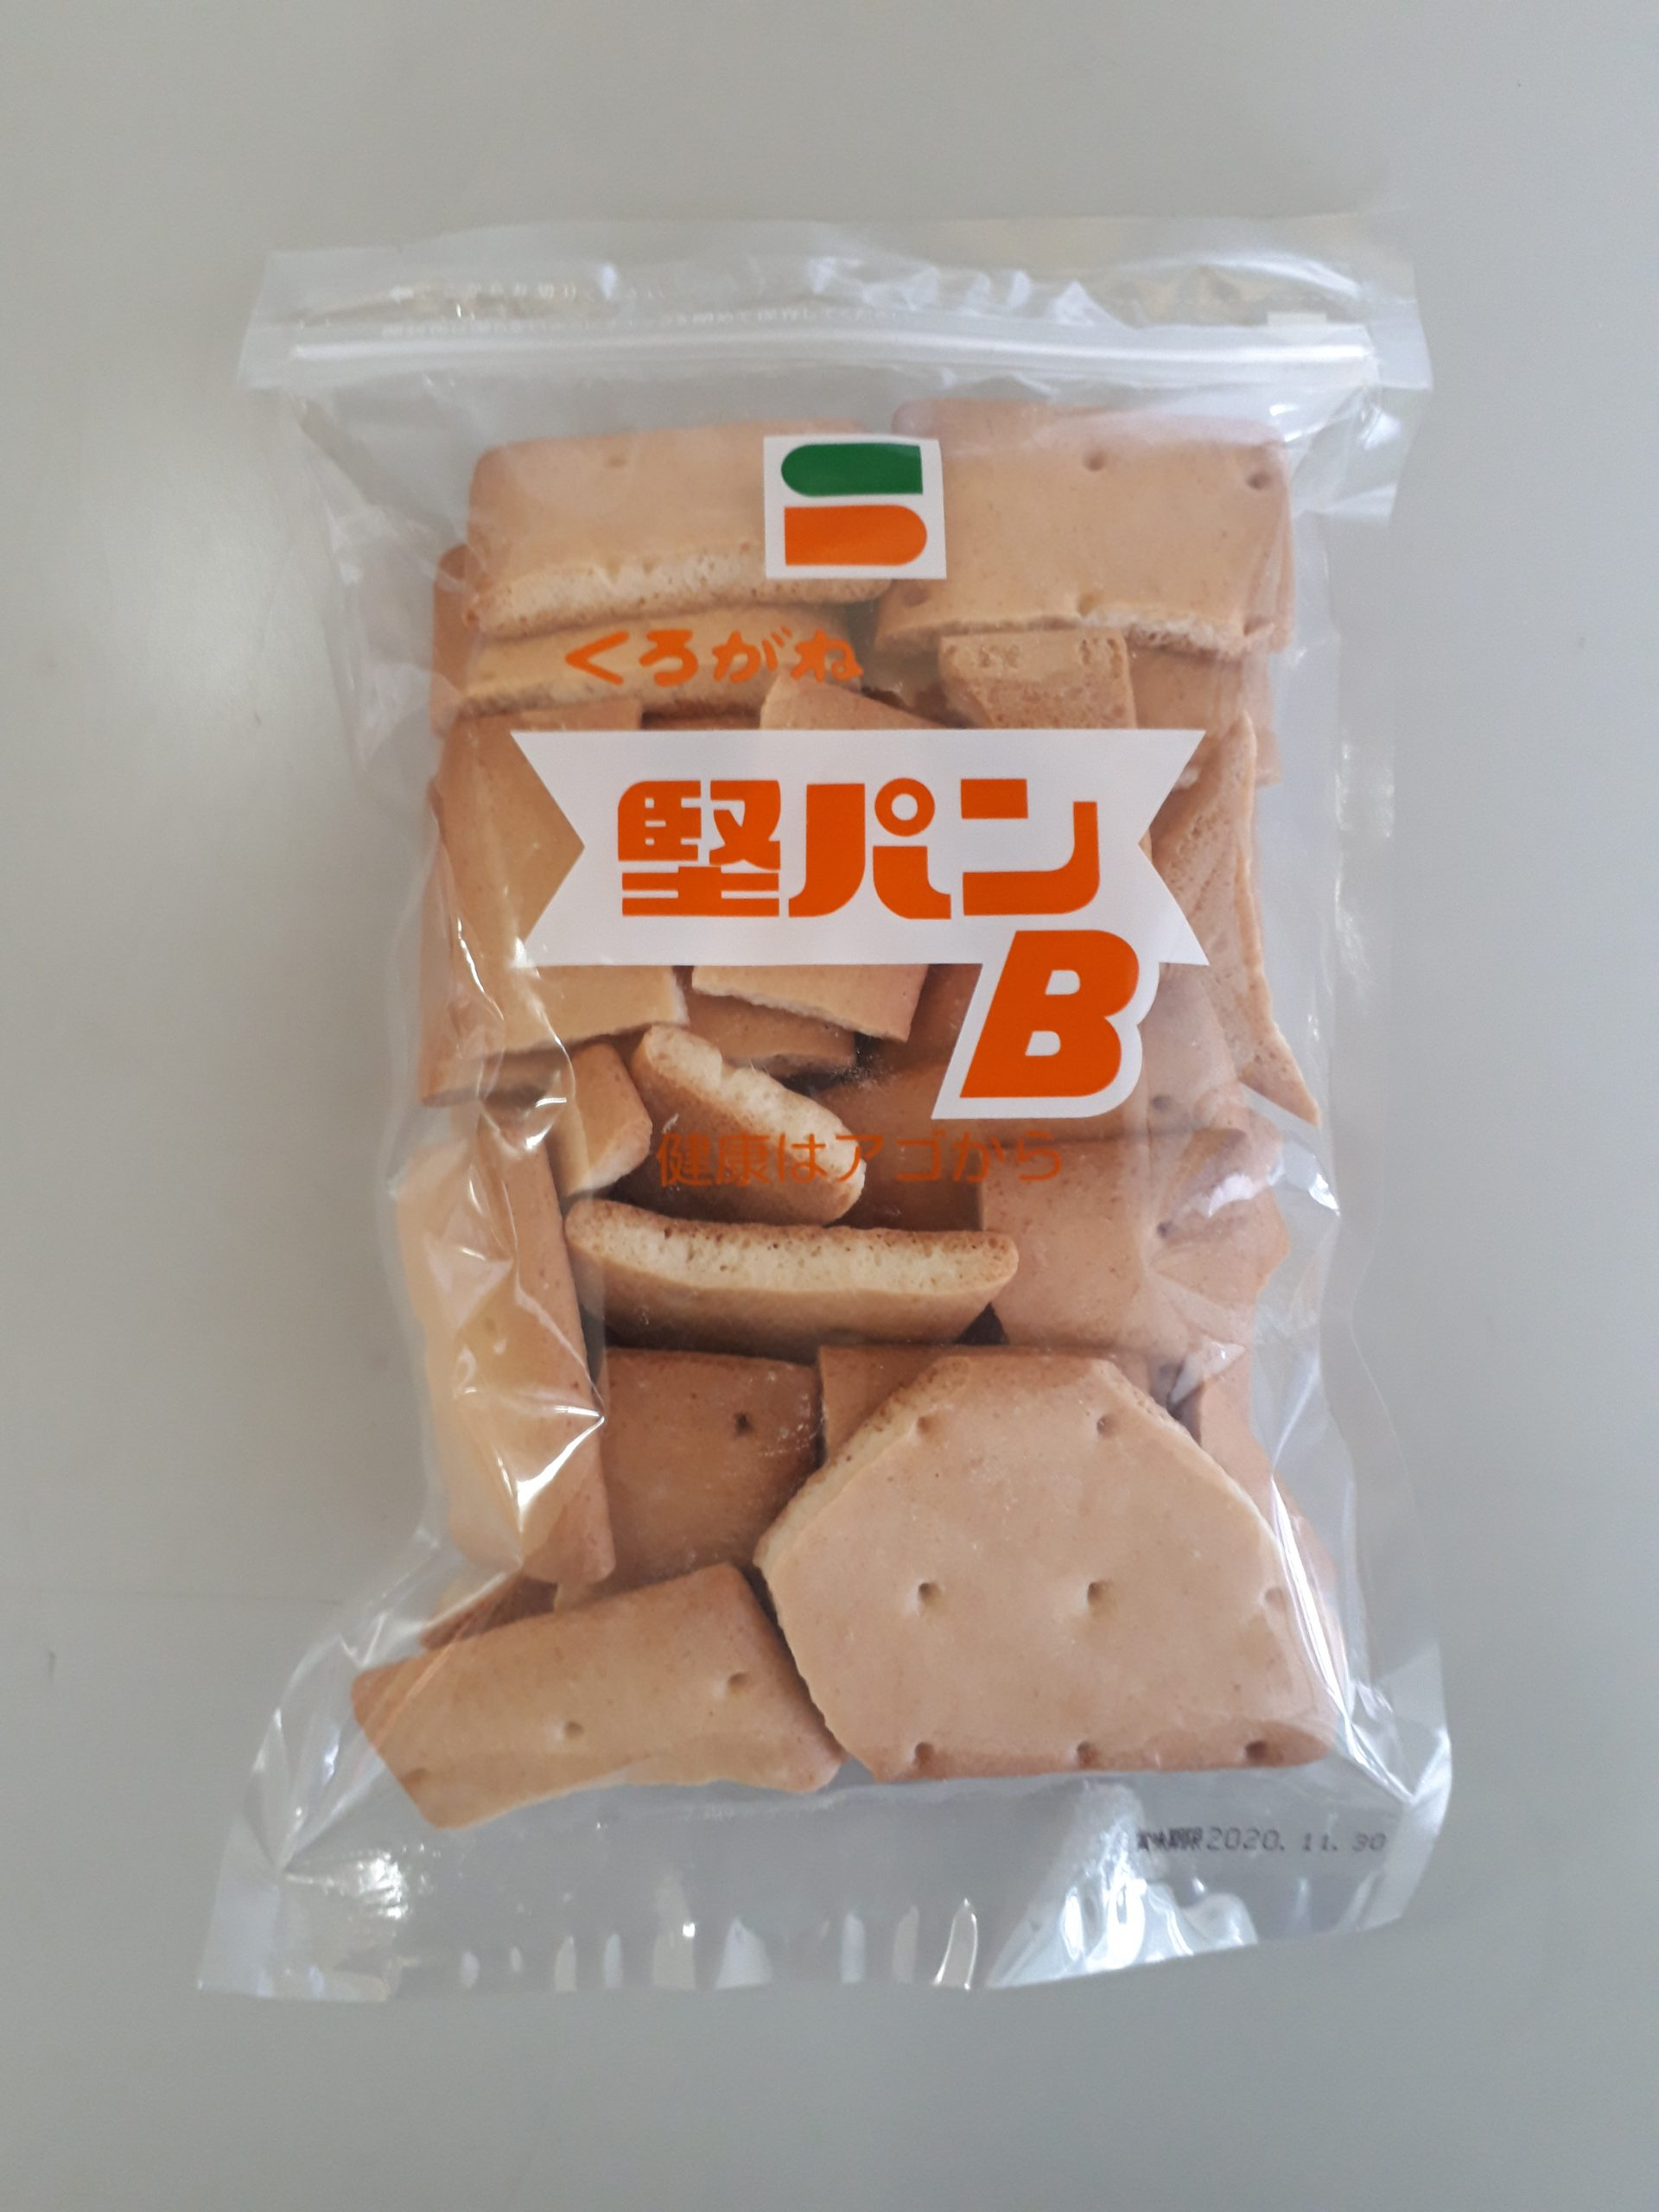 kcta-candy-wareB-plain